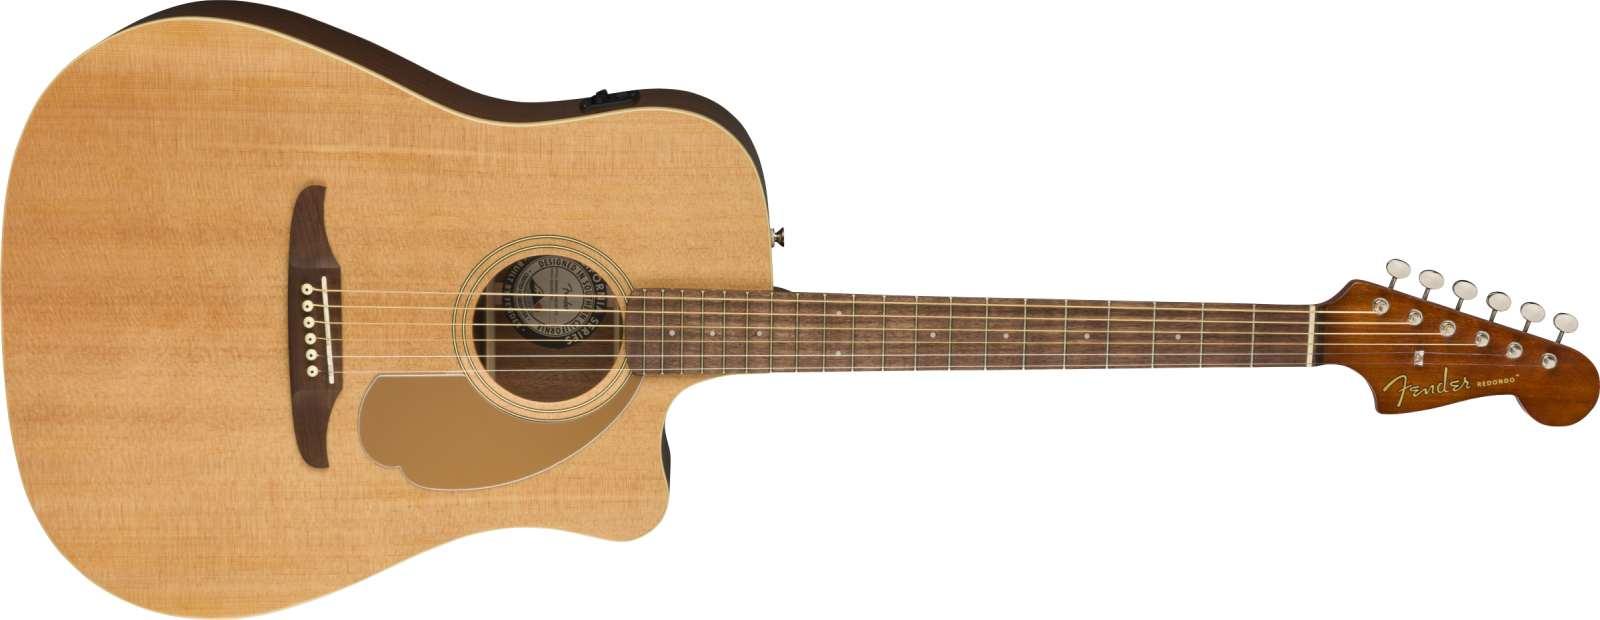 Fender Redondo Player Natur